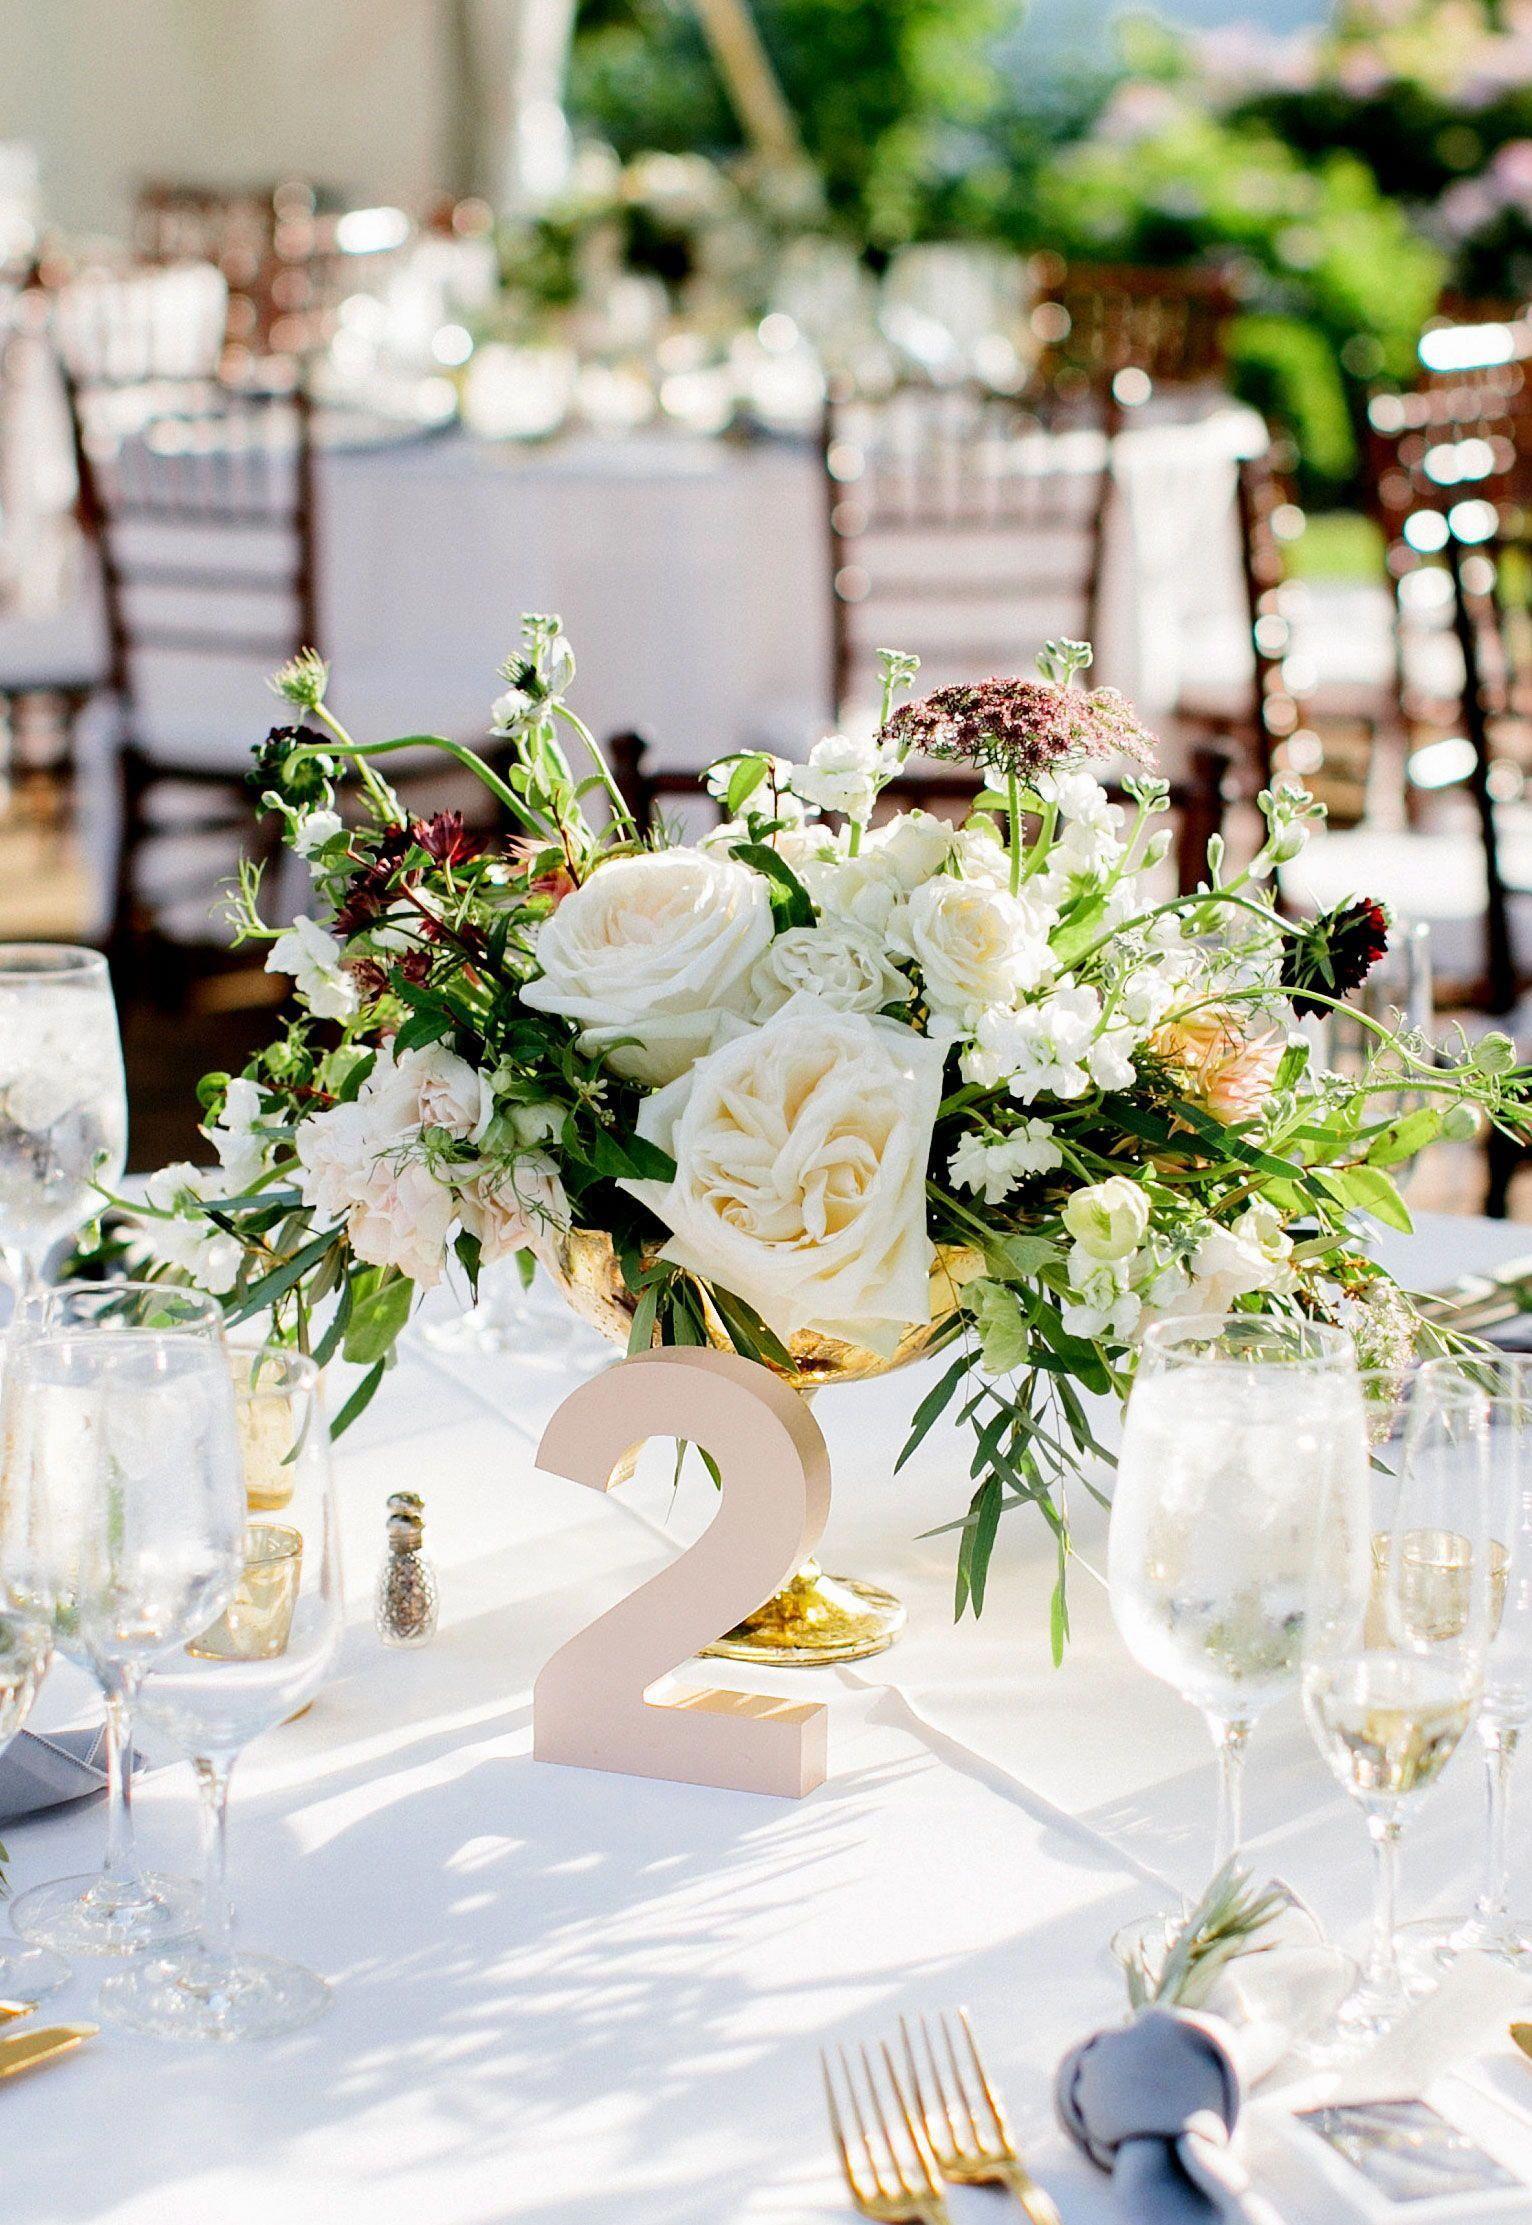 Handmade Wedding Decor